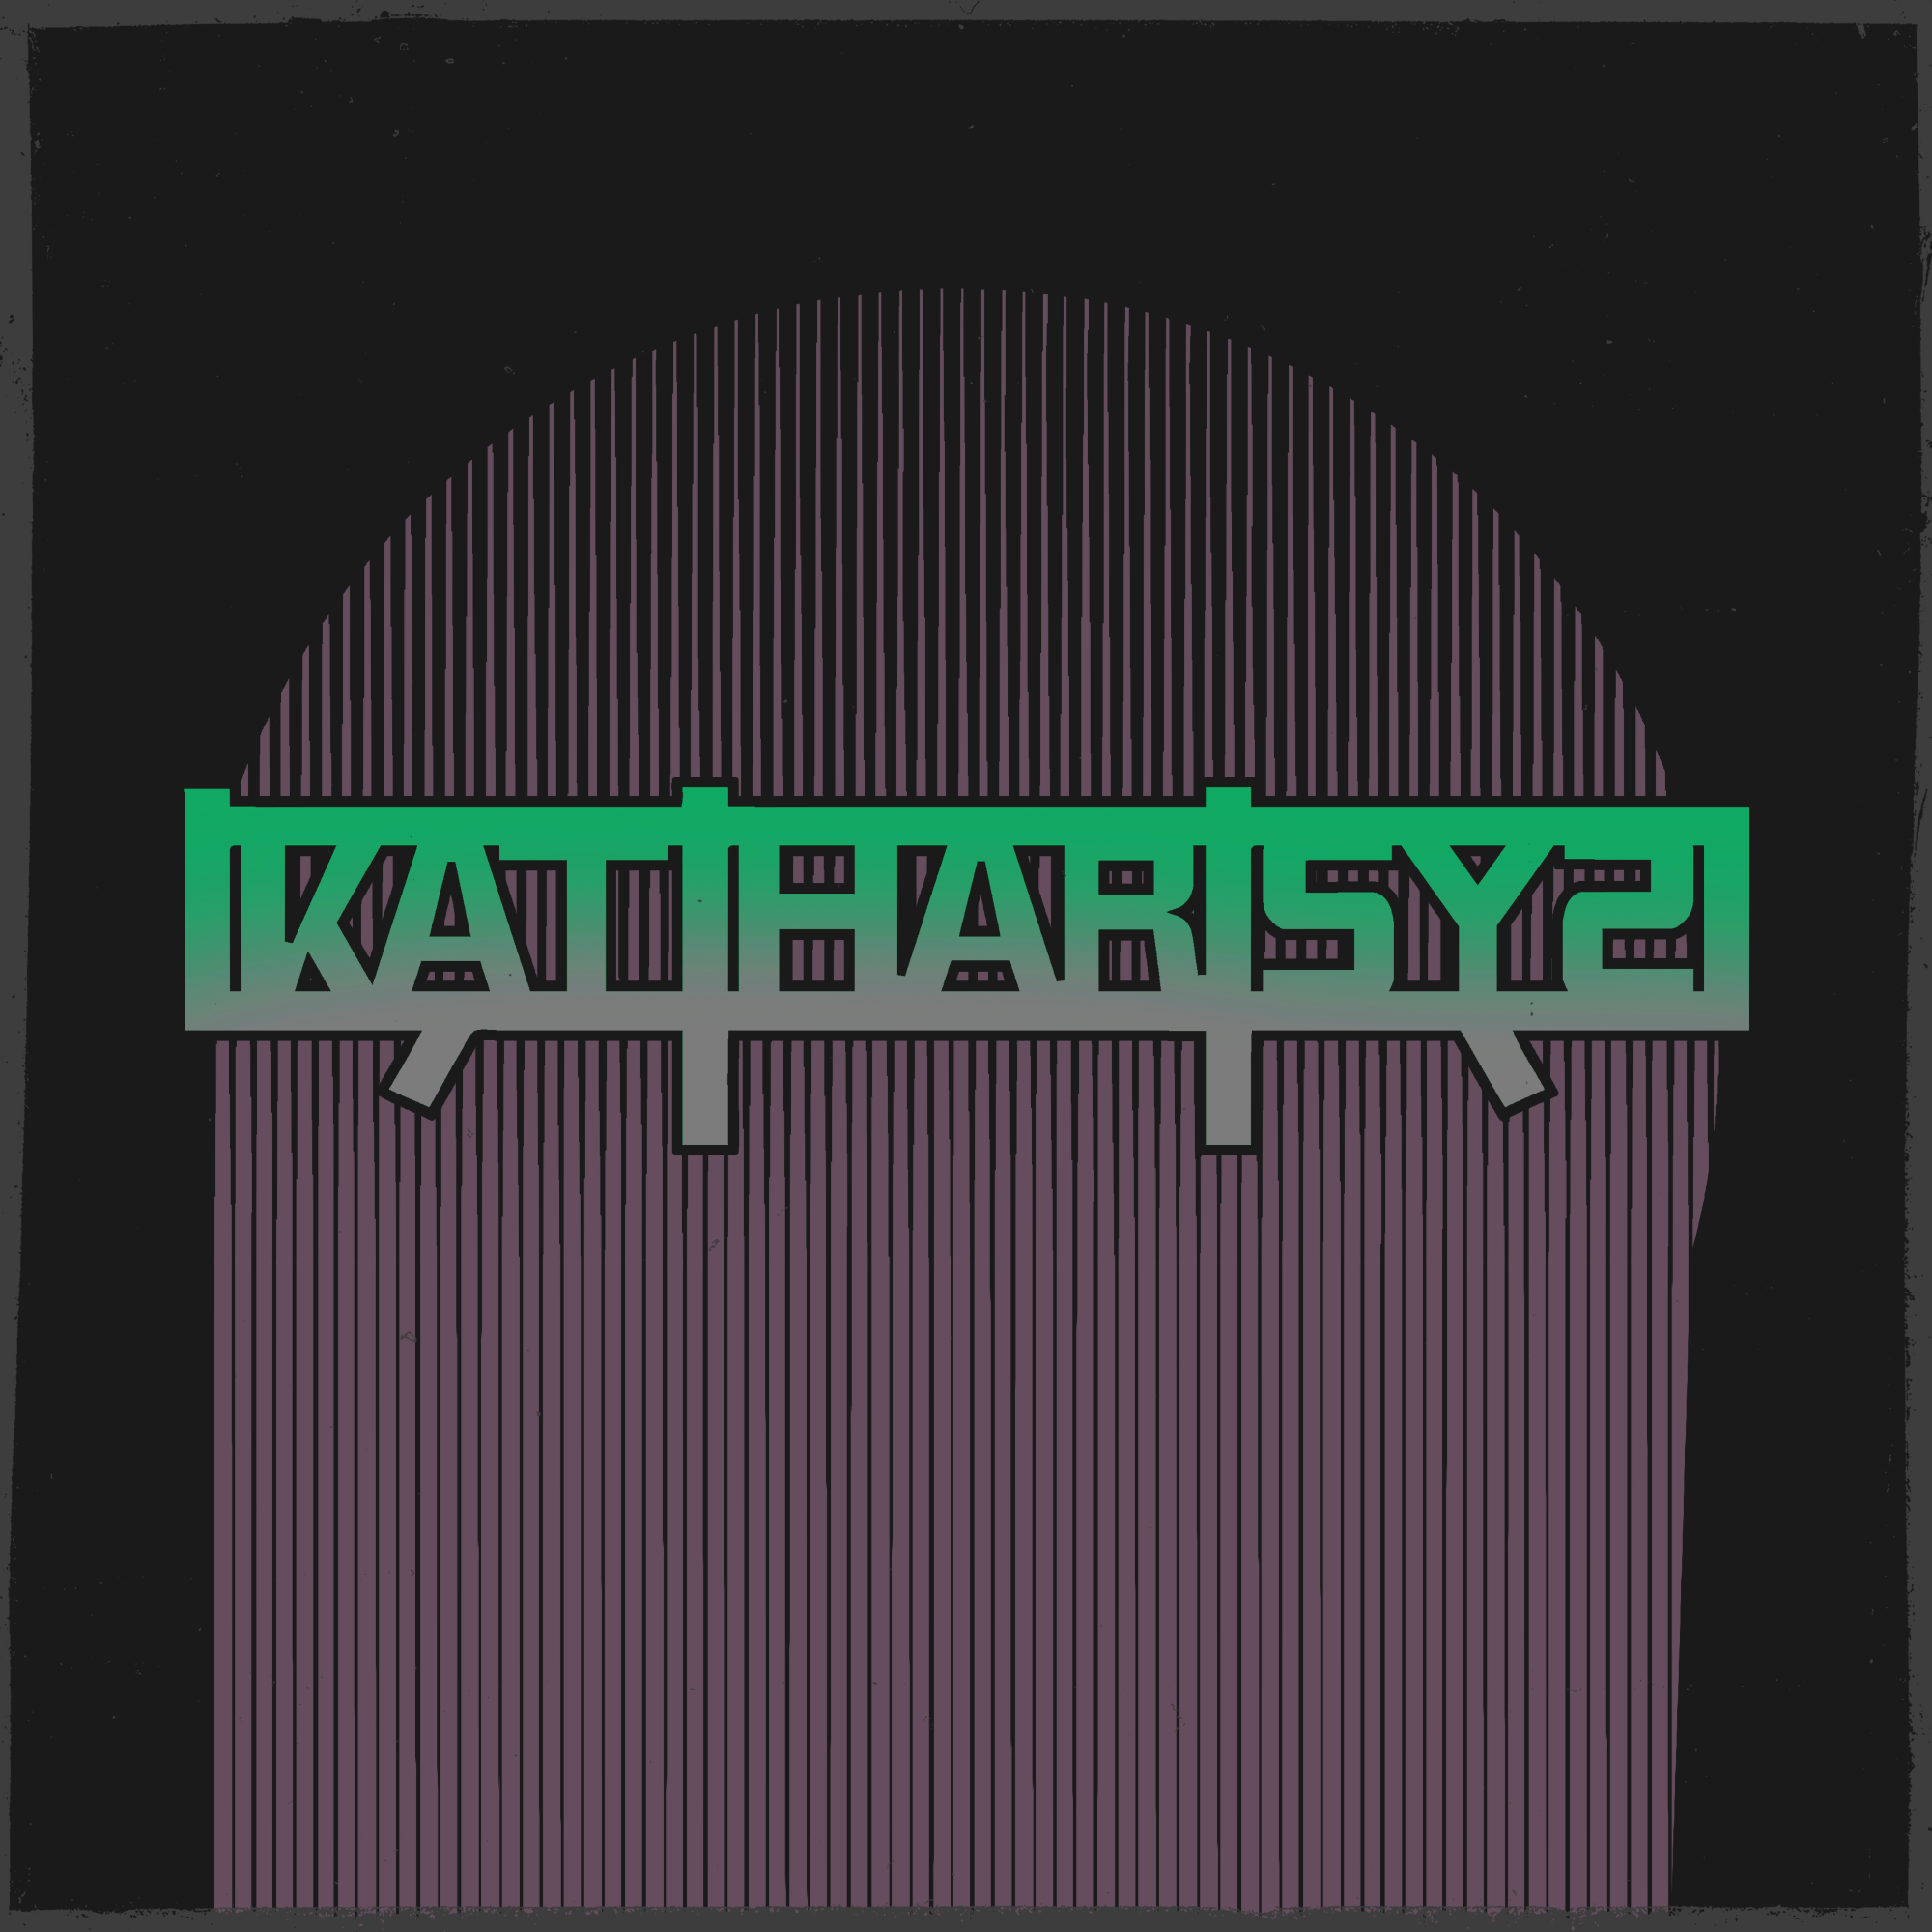 Katharsys.png